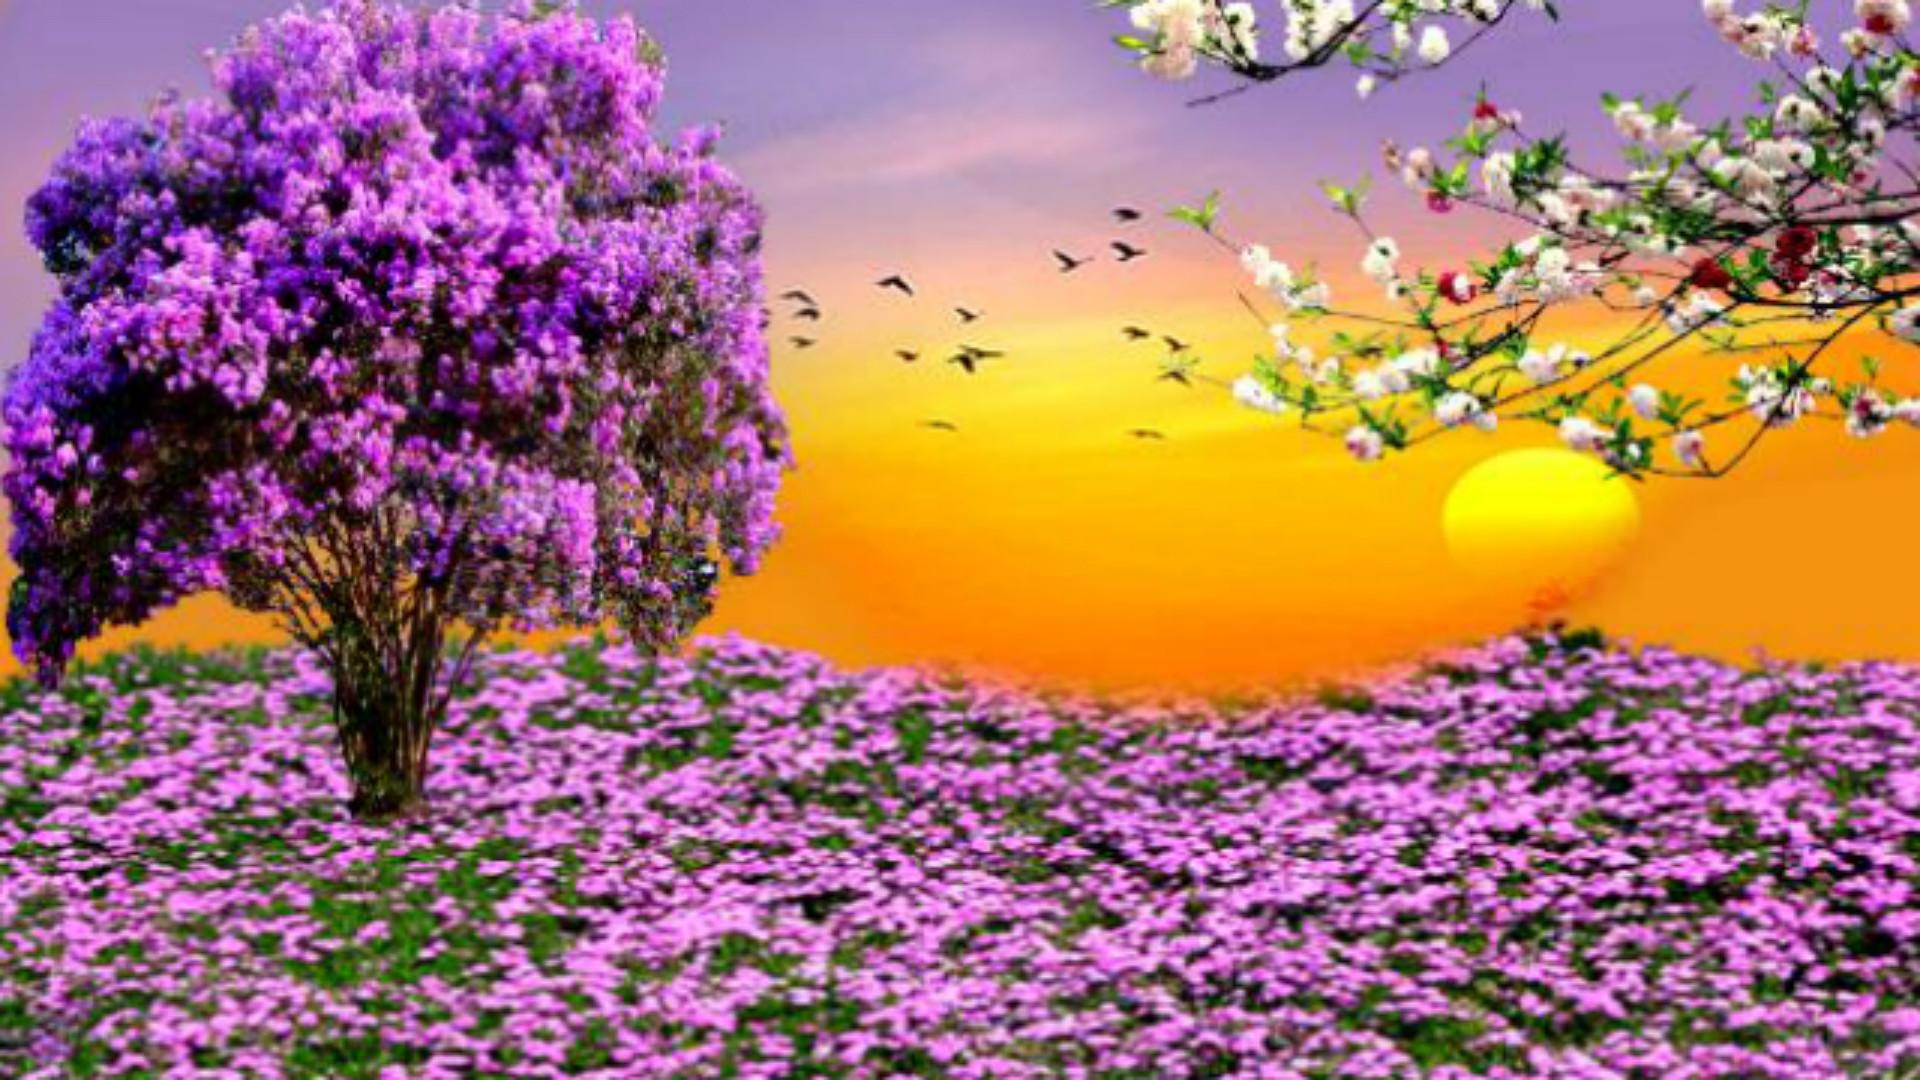 Nature Spring Purple Flowers Garden Sunset HD Wallpapers For Desktop